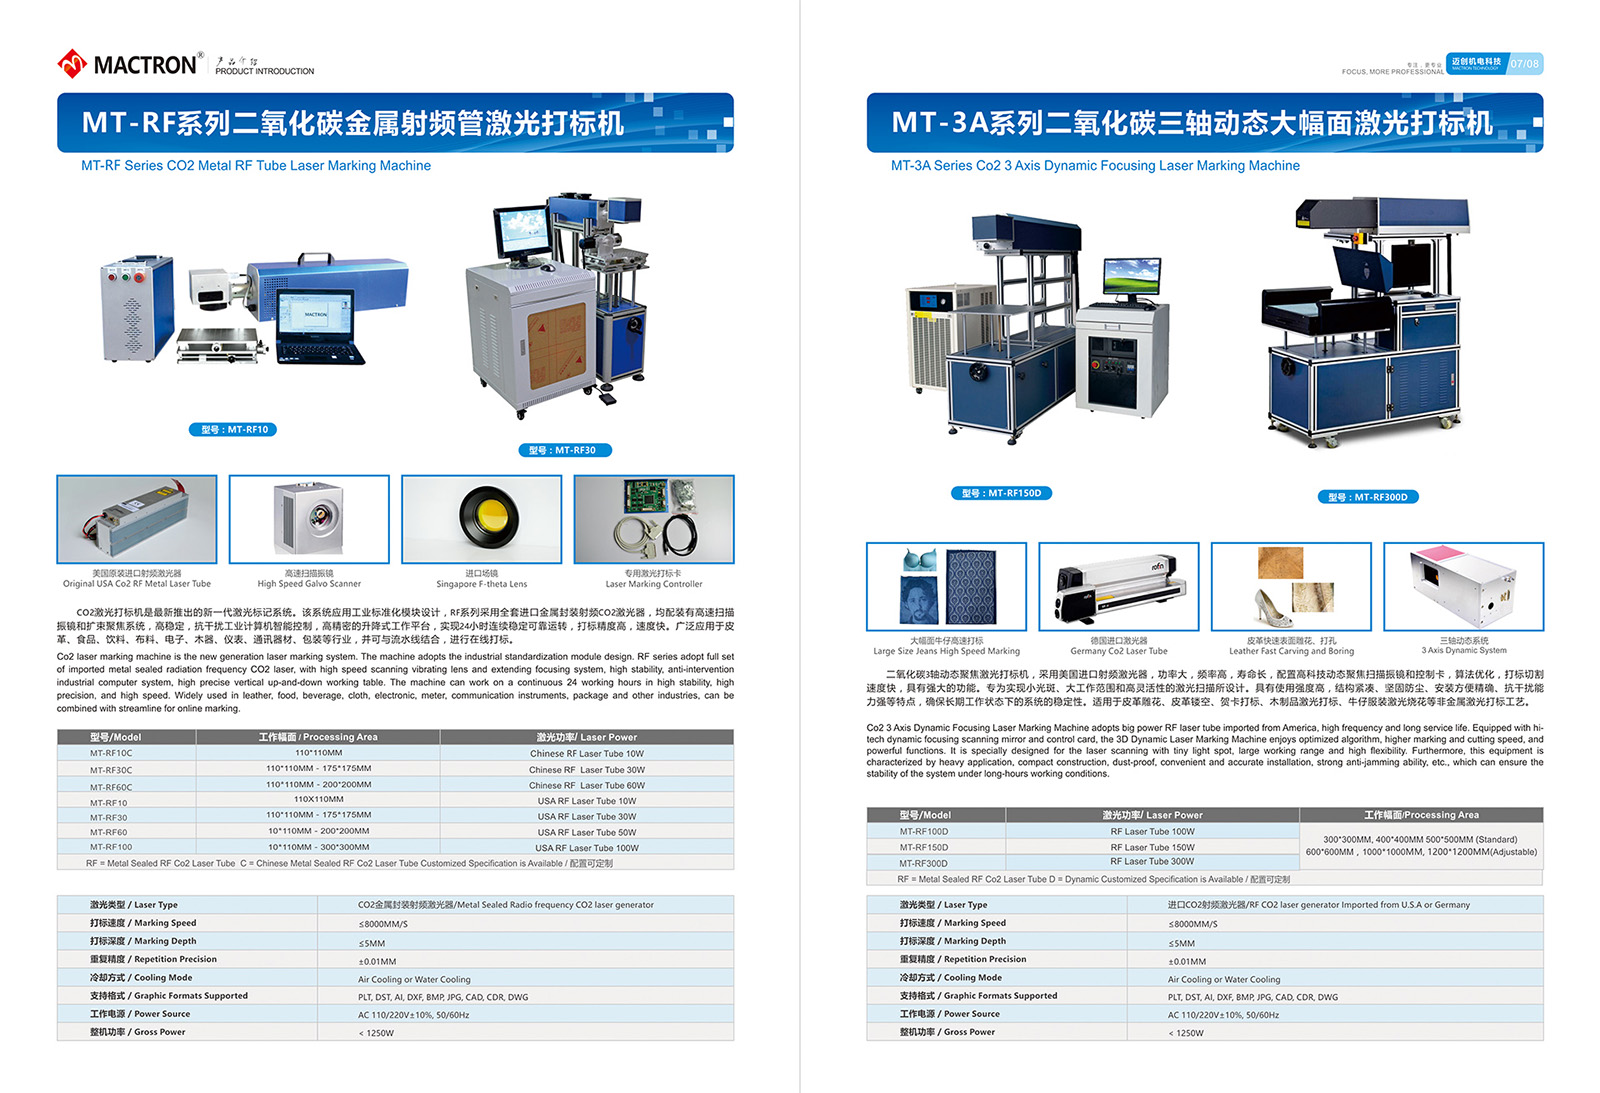 Mactron Tech Laser Catalogue 2017 (5)